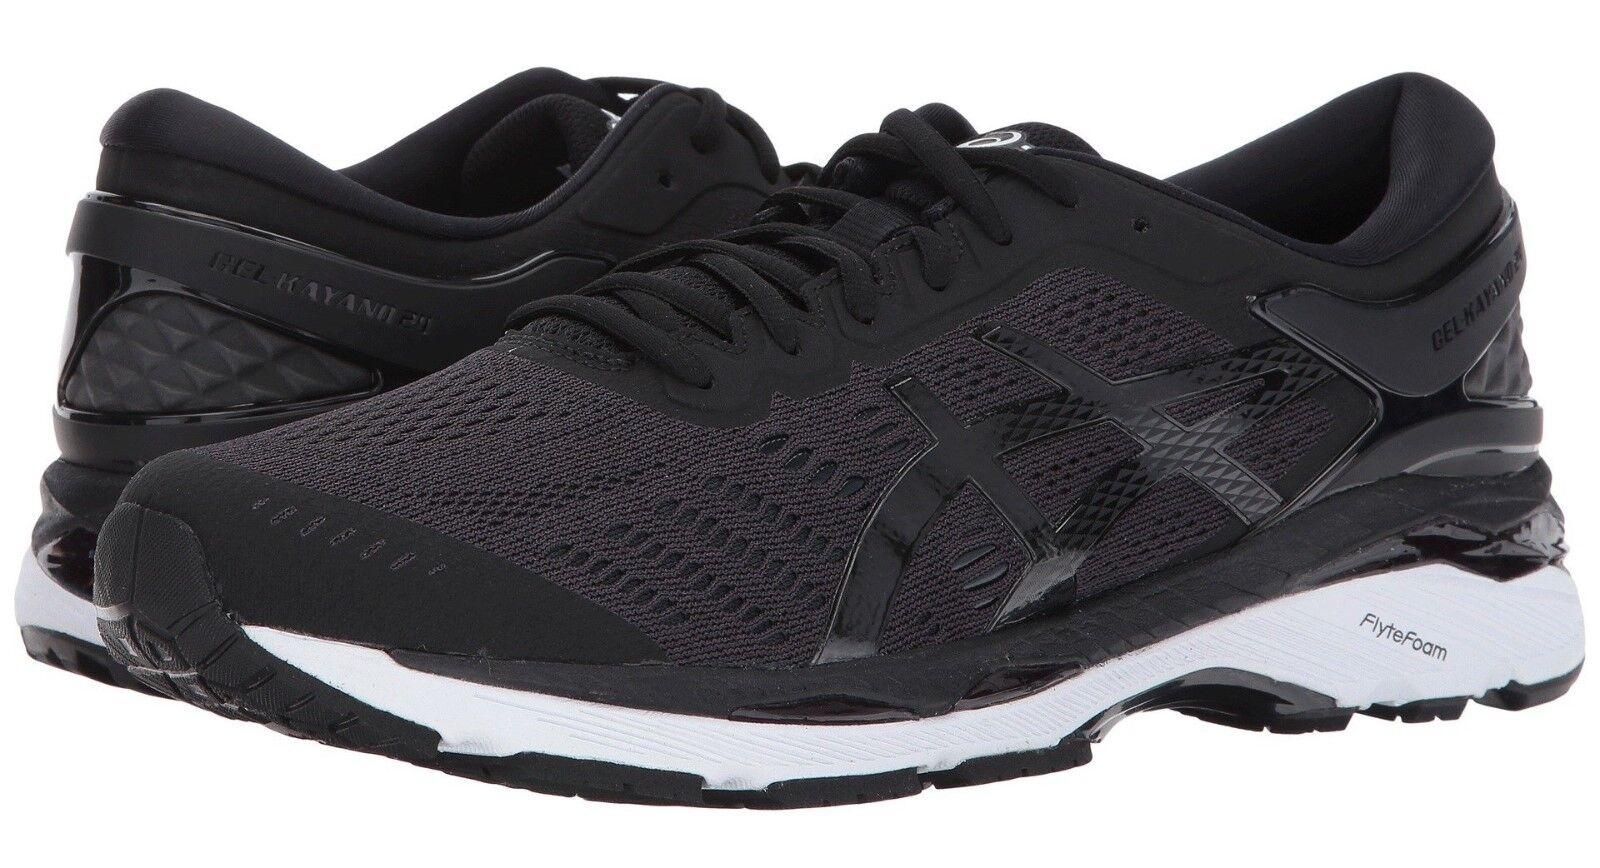 Nuova Uomo asic gel-kayano scarpe 24 corsa / formazione scarpe gel-kayano - 8,5 / 160 - nero ba5ad8